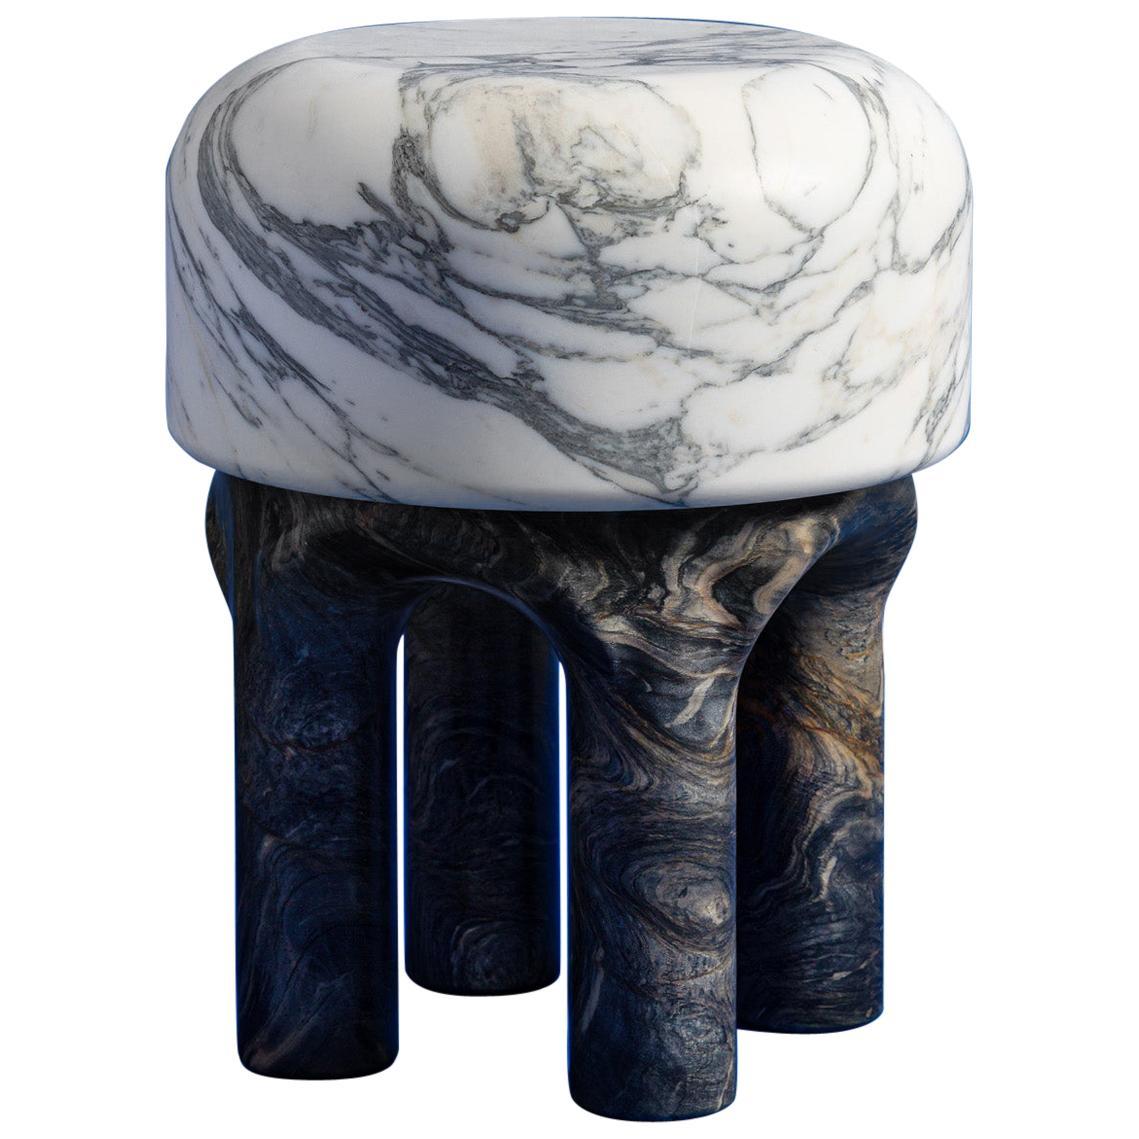 Spinzi  Medusa white and dark marble side table